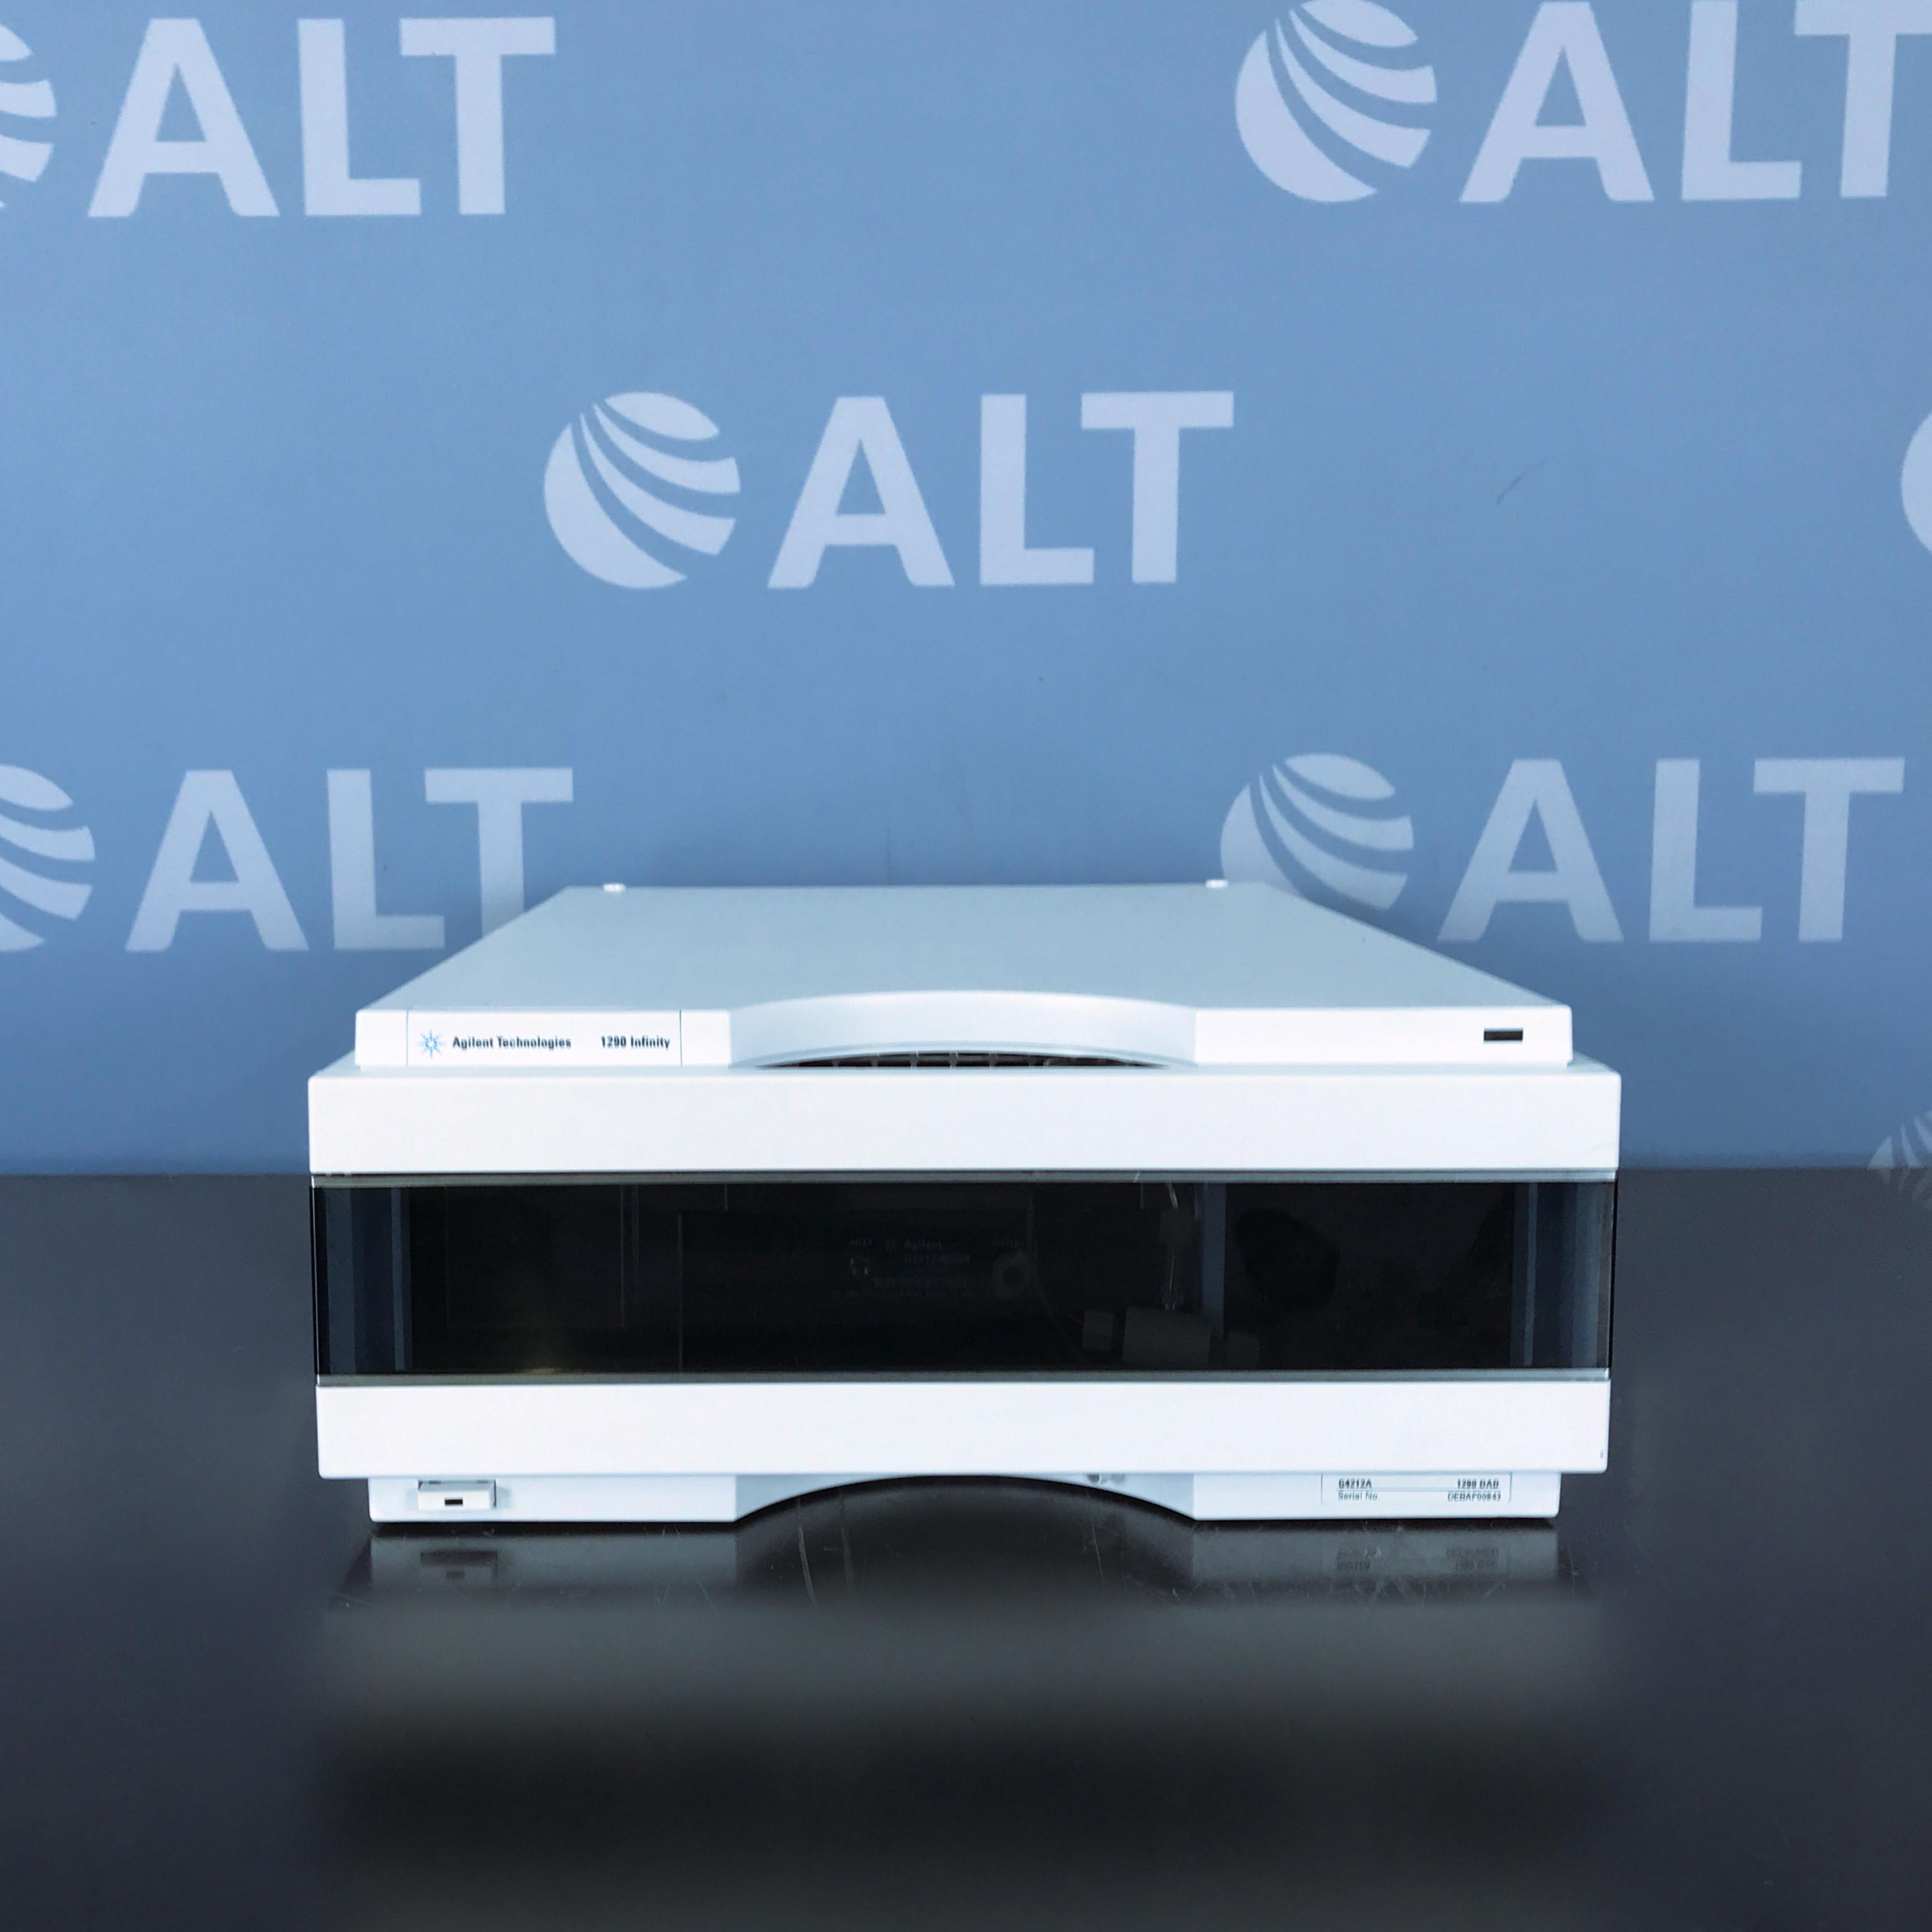 Agilent 1200/1290 Series HPLC System Image